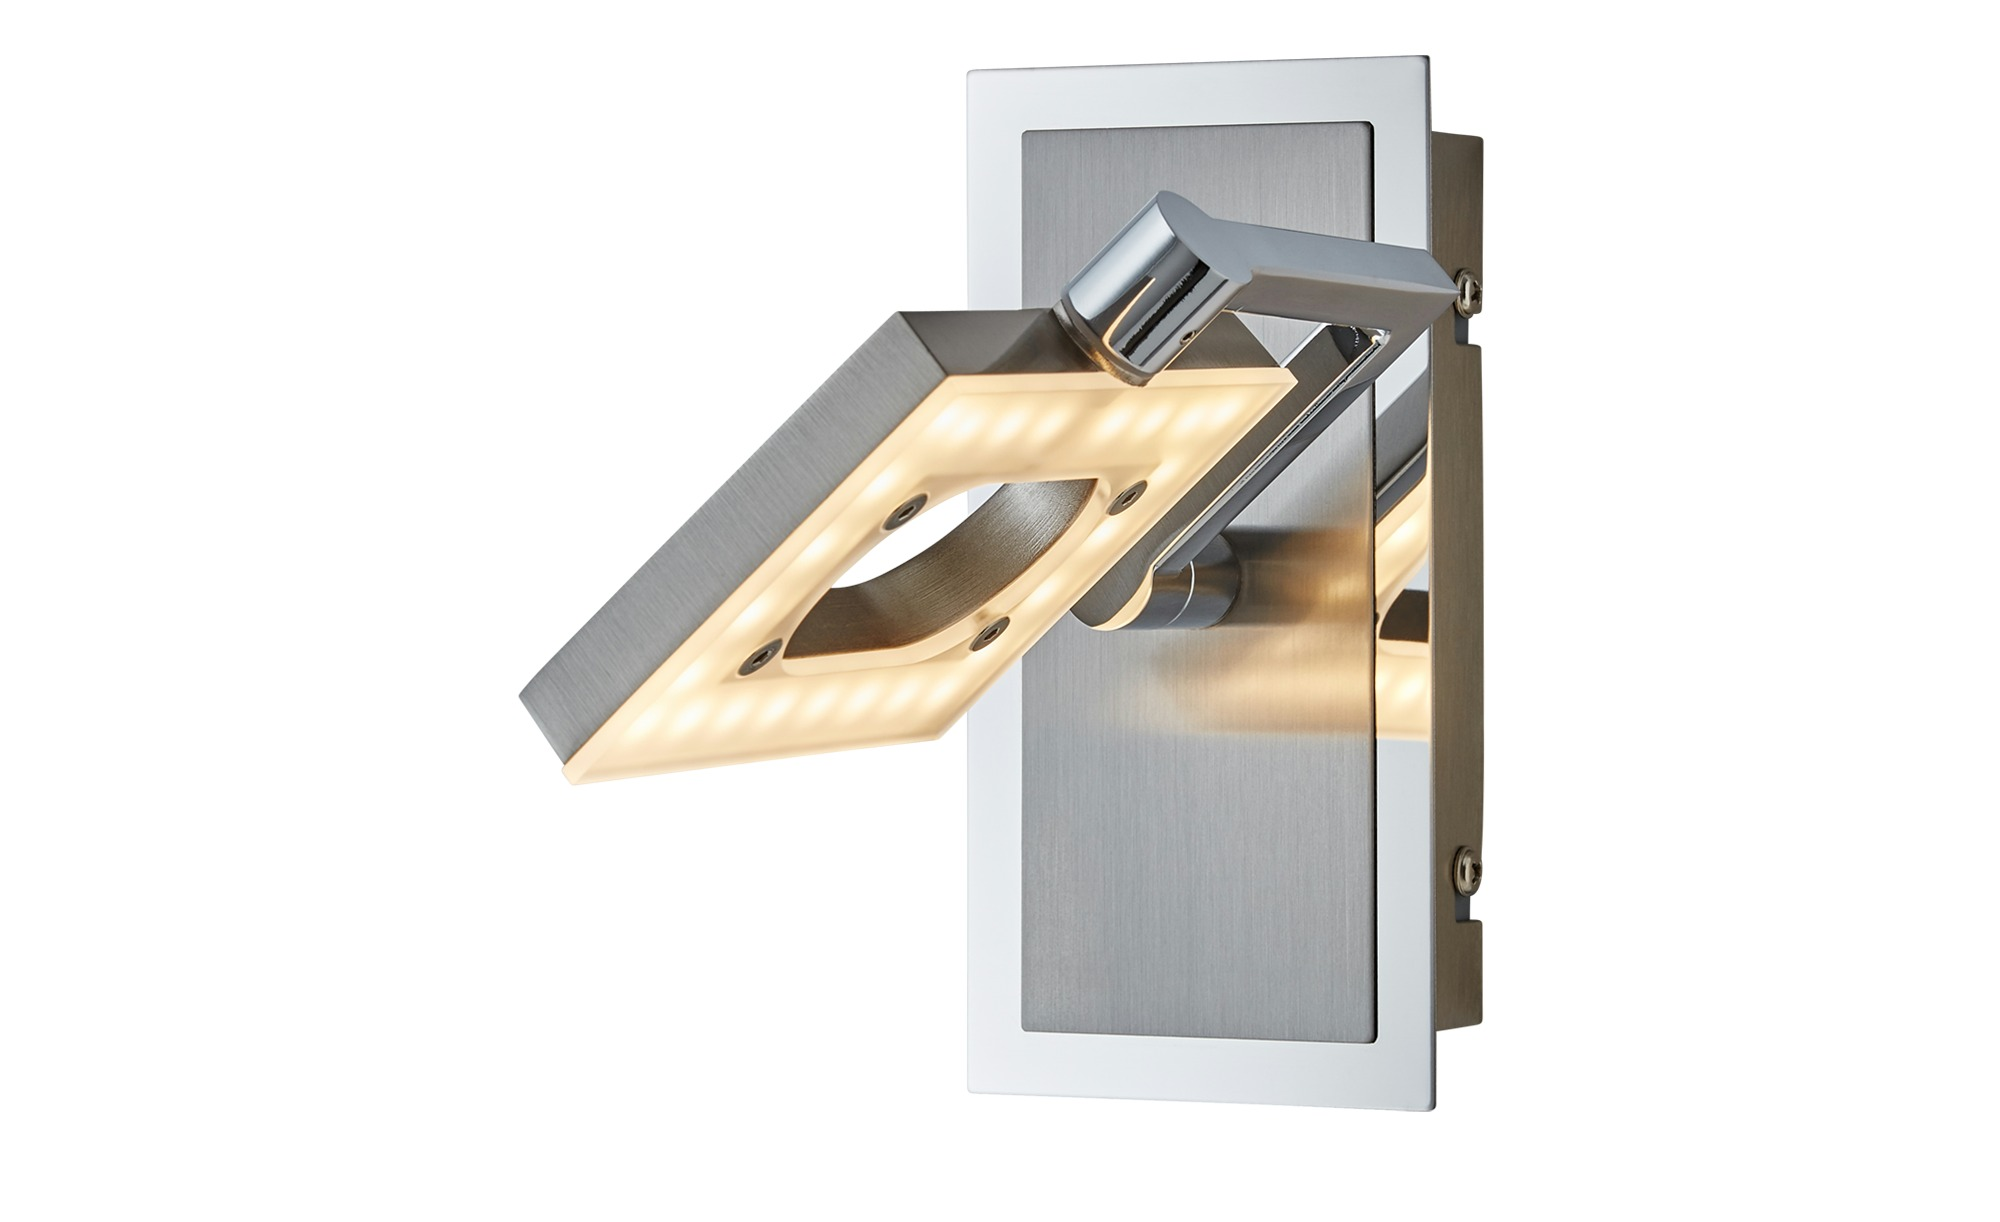 Fischer-Honsel LED- Wandstrahler, 1-flammig, nickel matt, Kopf eckig ¦ silber ¦ Maße (cm): B: 9,5 T: 17,5 Lampen & Leuchten > Innenleuchten > Wandleuchten - Höffner